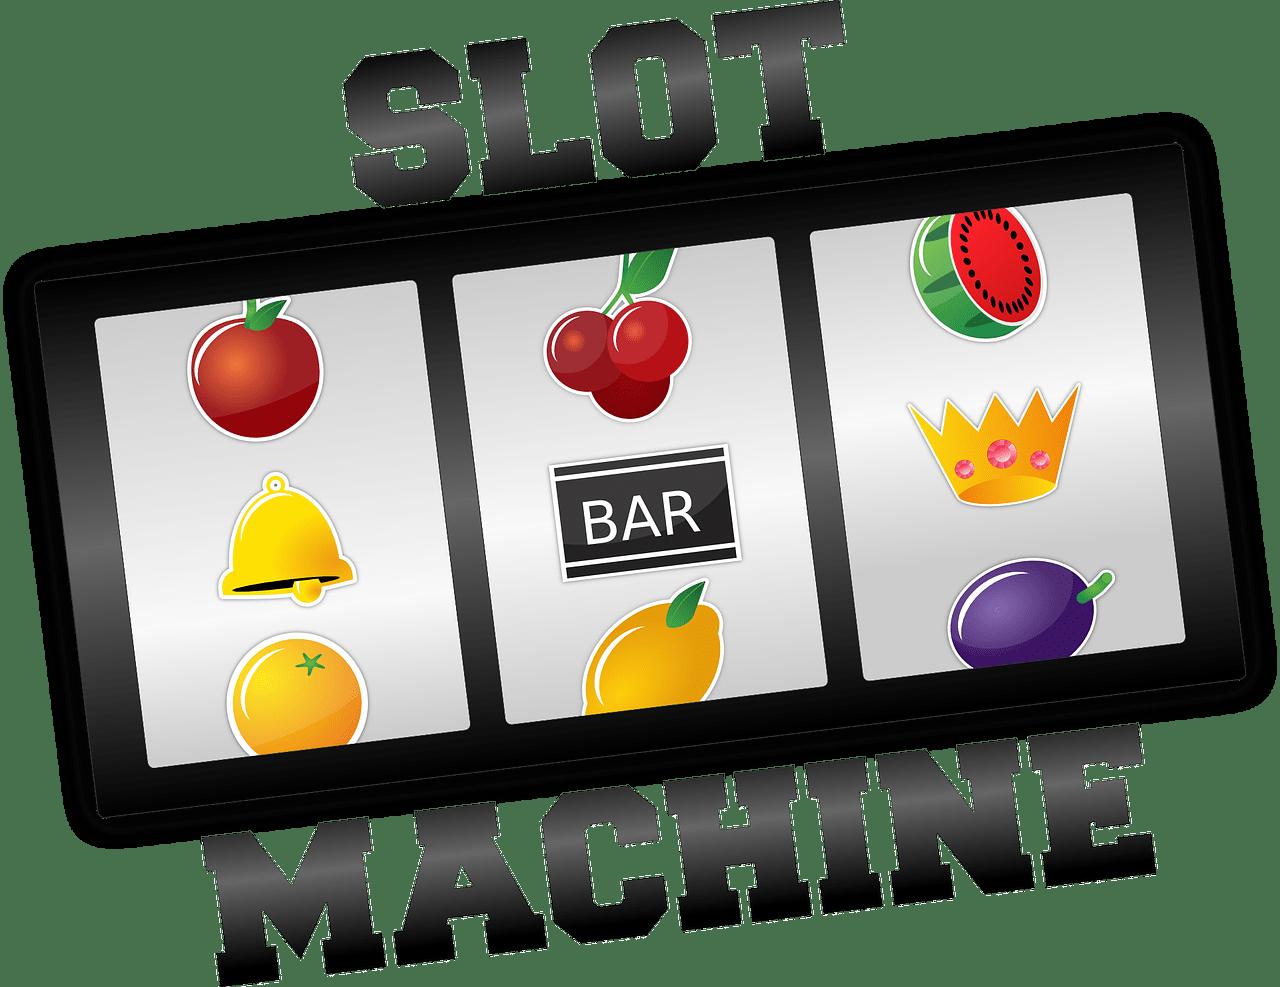 slot-machine-159972_1280